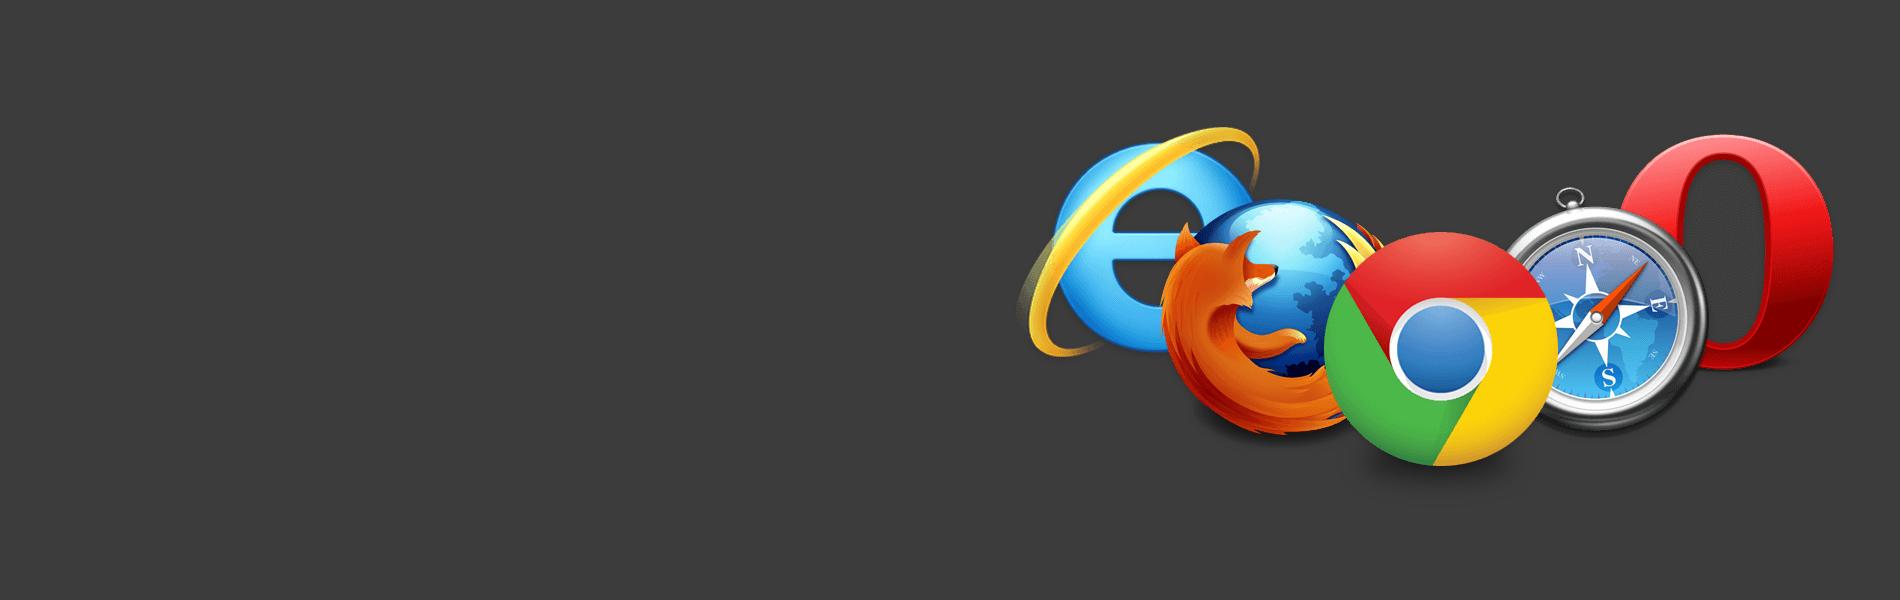 Cross_Browser_Testing_Website